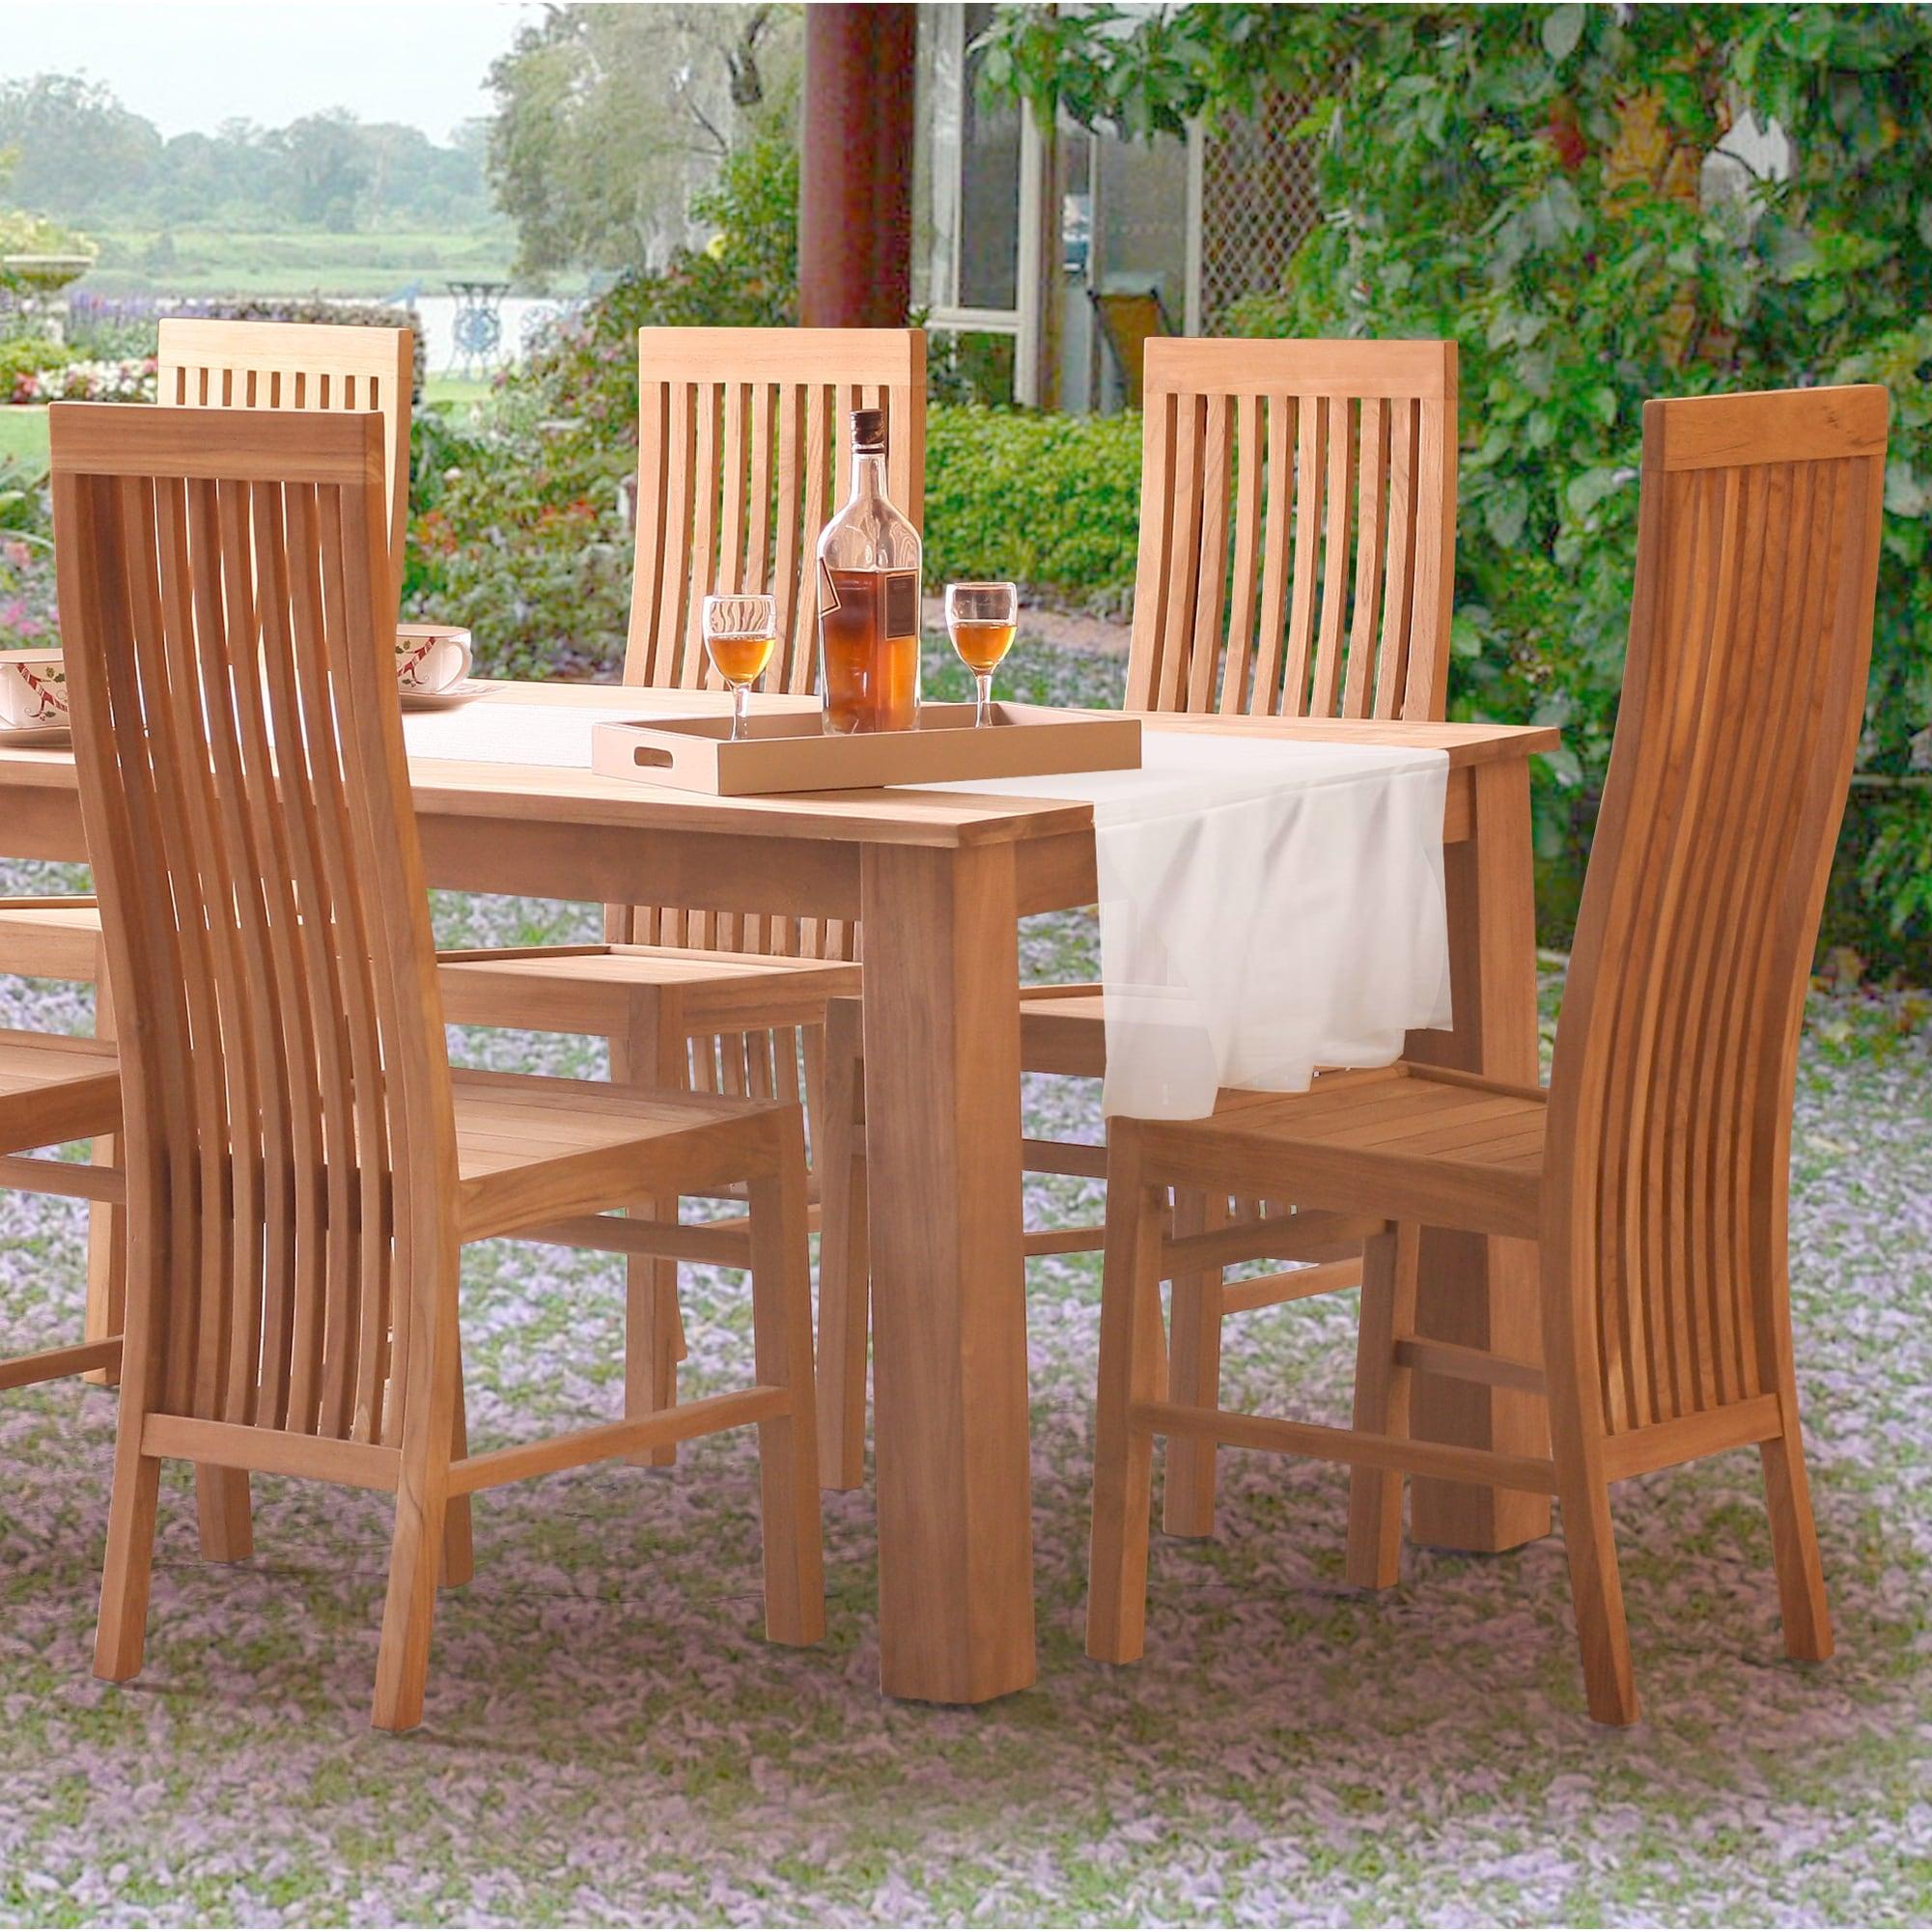 Shop Chic Teak West Palm Teak Wood Indoor Outdoor Dining Side Chair Overstock 31477257